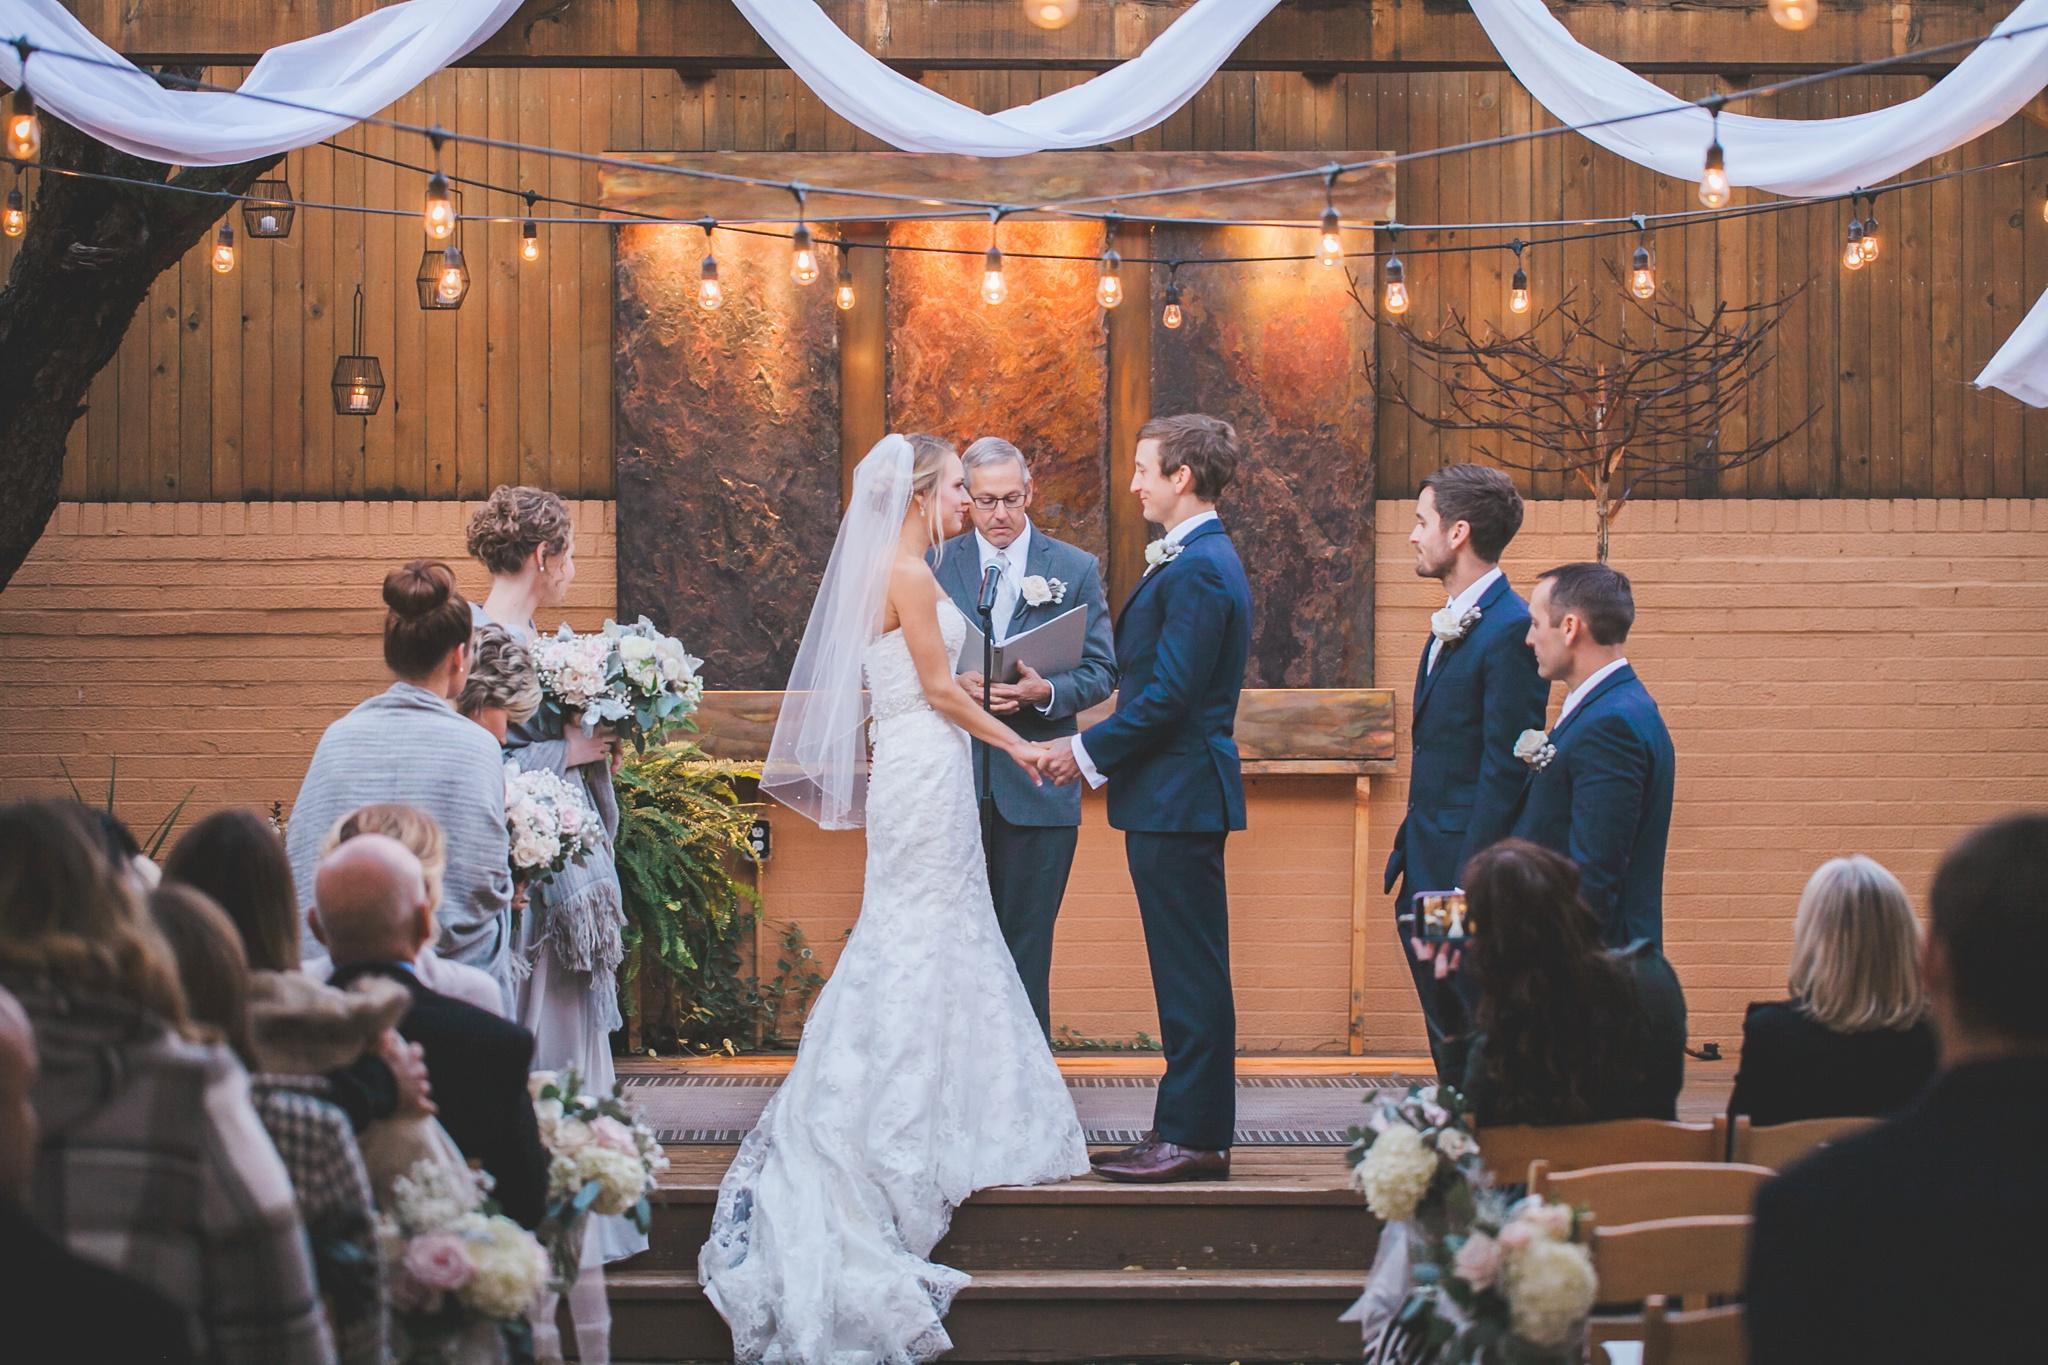 St. Louis Wedding Photographer   Chandler Rose Photography_0050.jpg